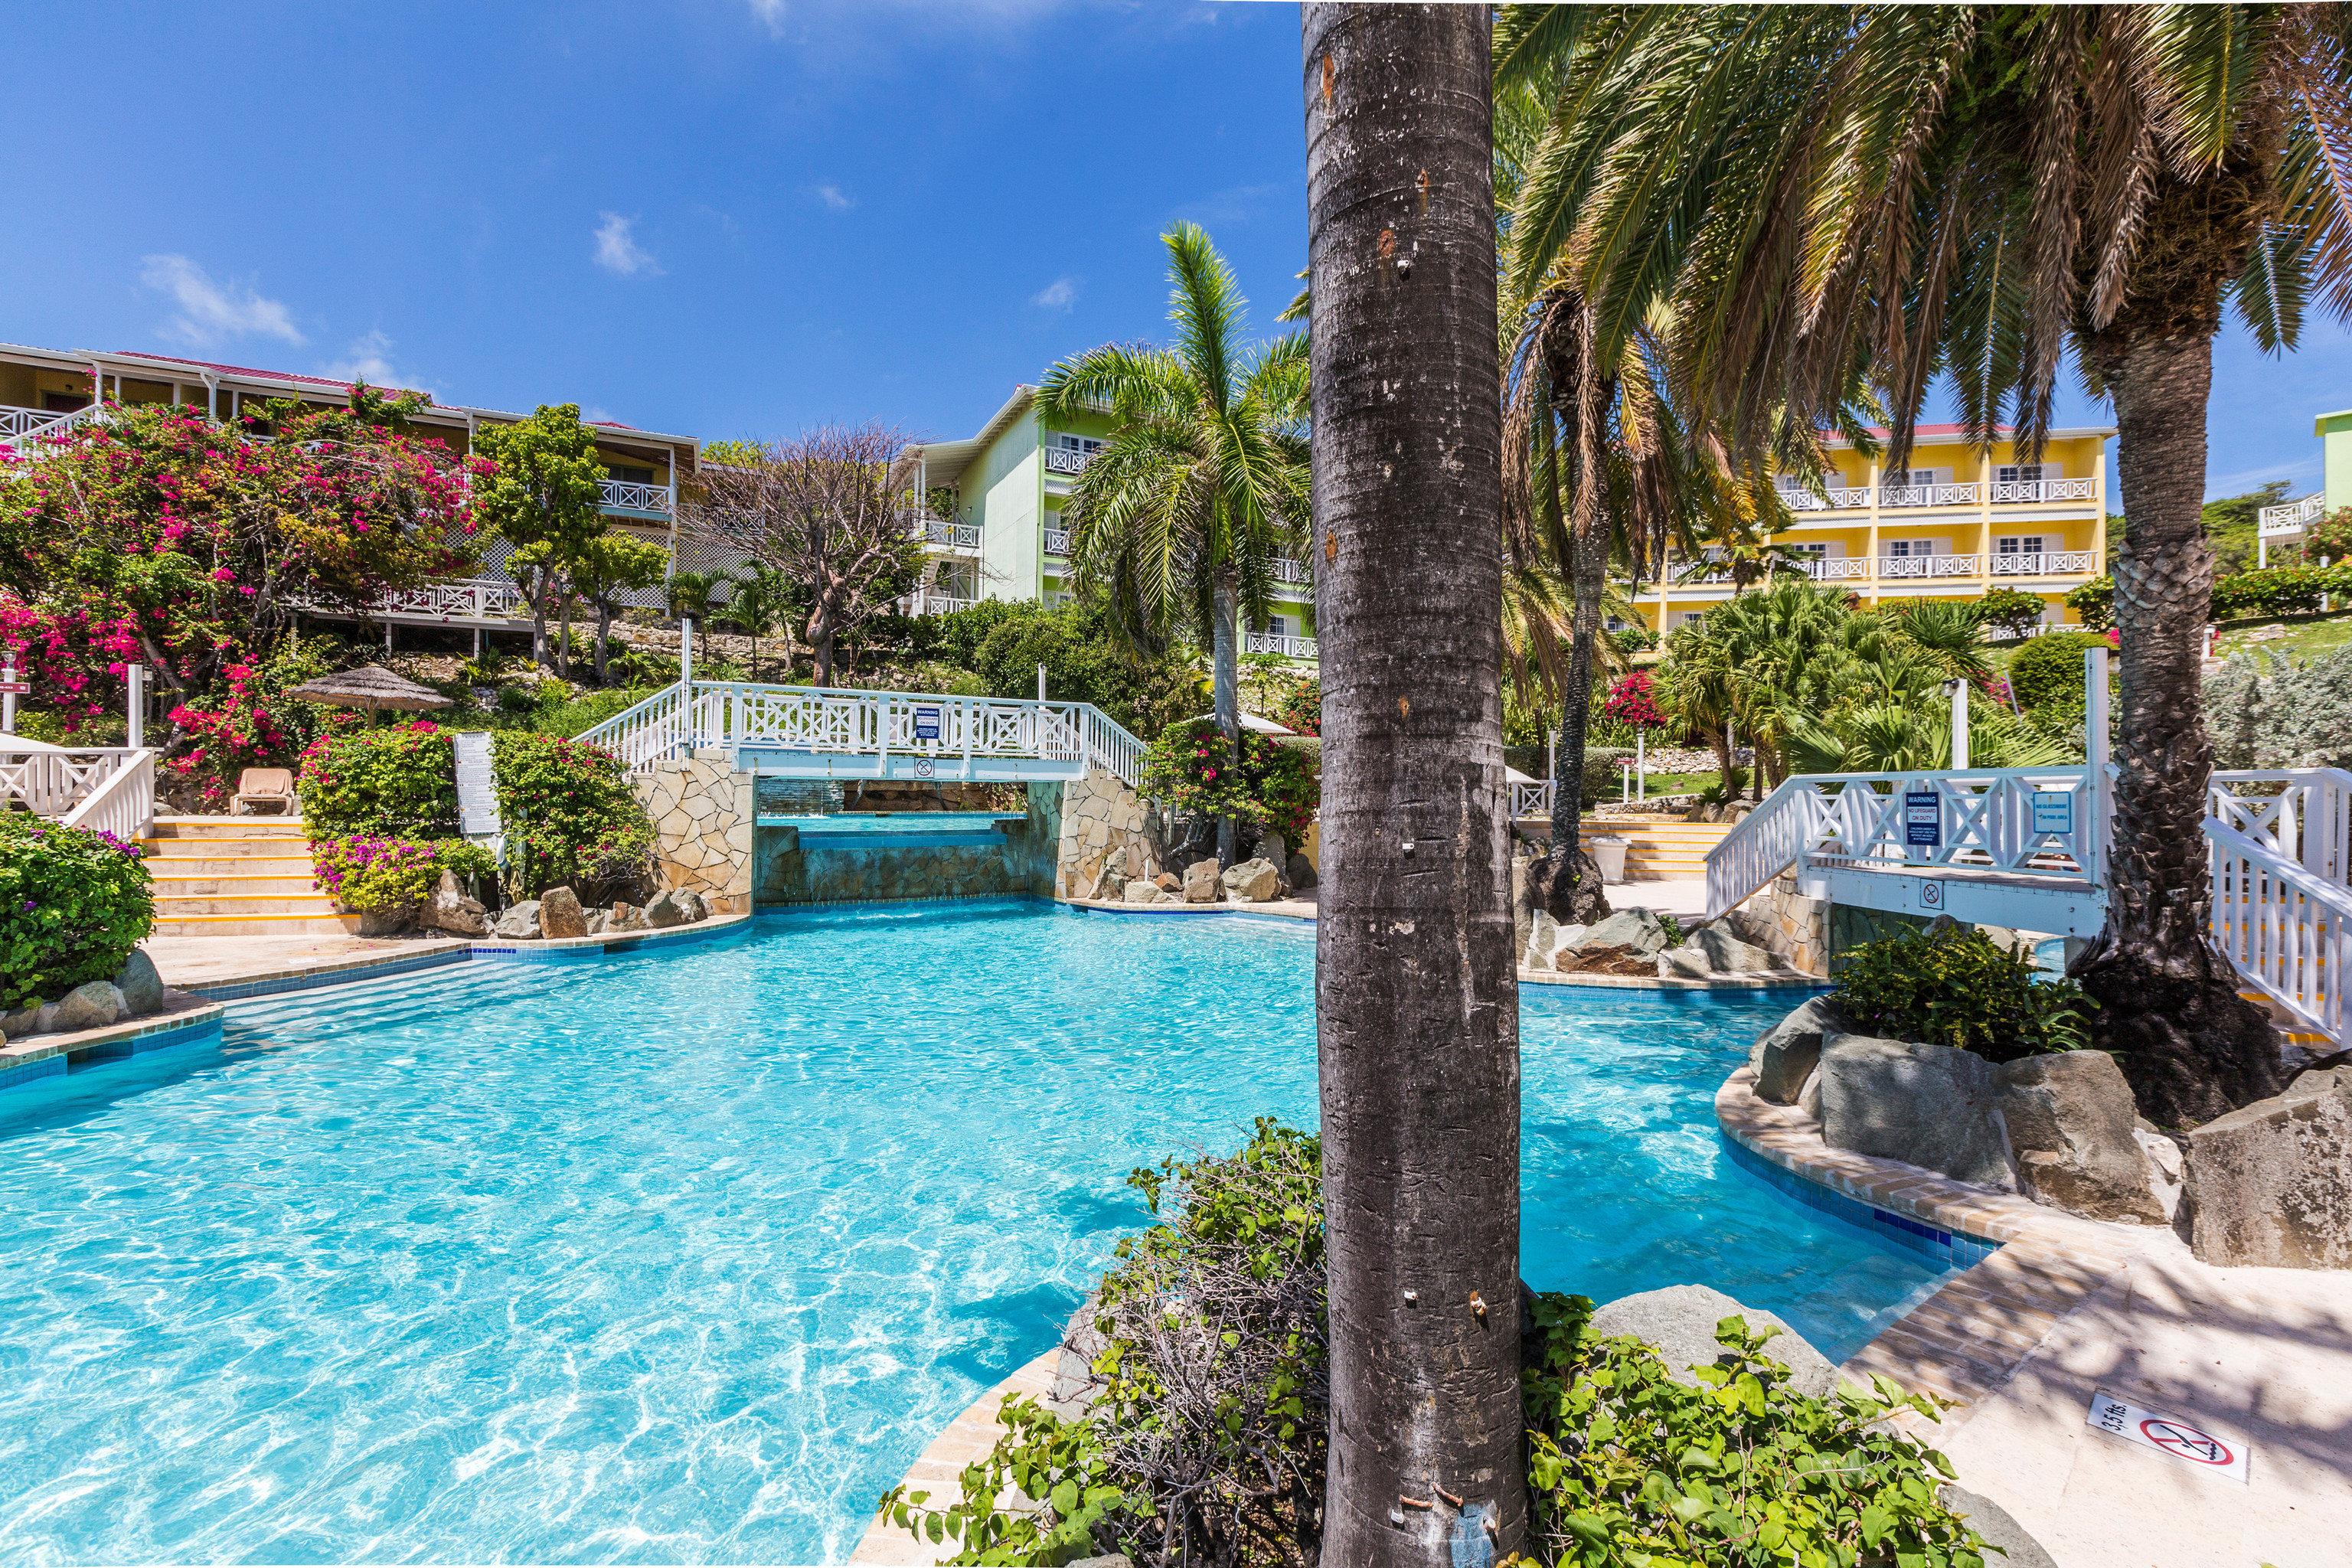 tree swimming pool property leisure Resort condominium resort town Pool Villa backyard Water park Garden